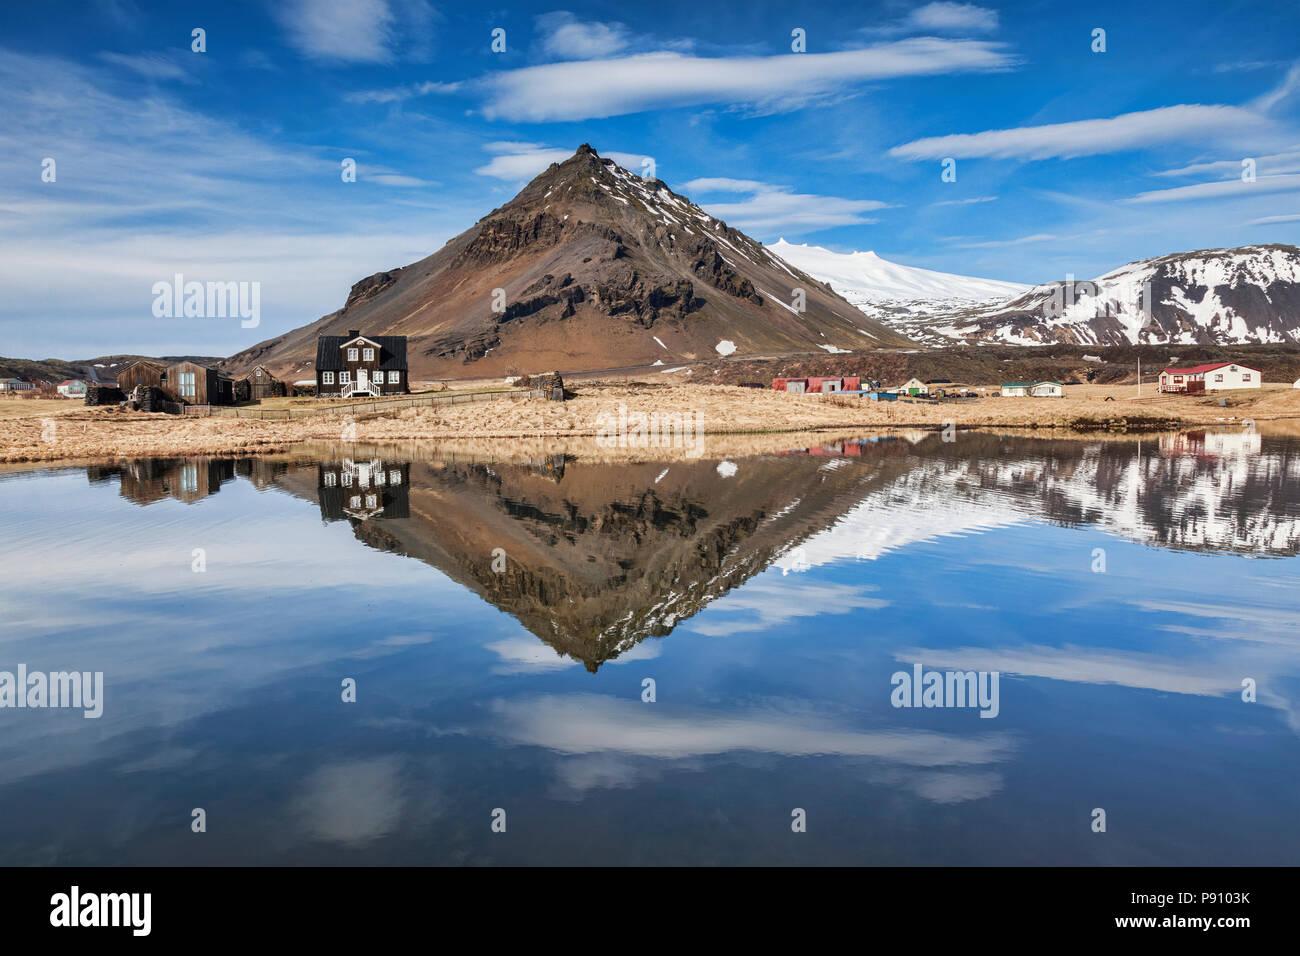 Der Berg Stapafell reflektiert in einem Pool bei Arnarstapi auf der Halbinsel Snaefellsnes, Island. Stockbild